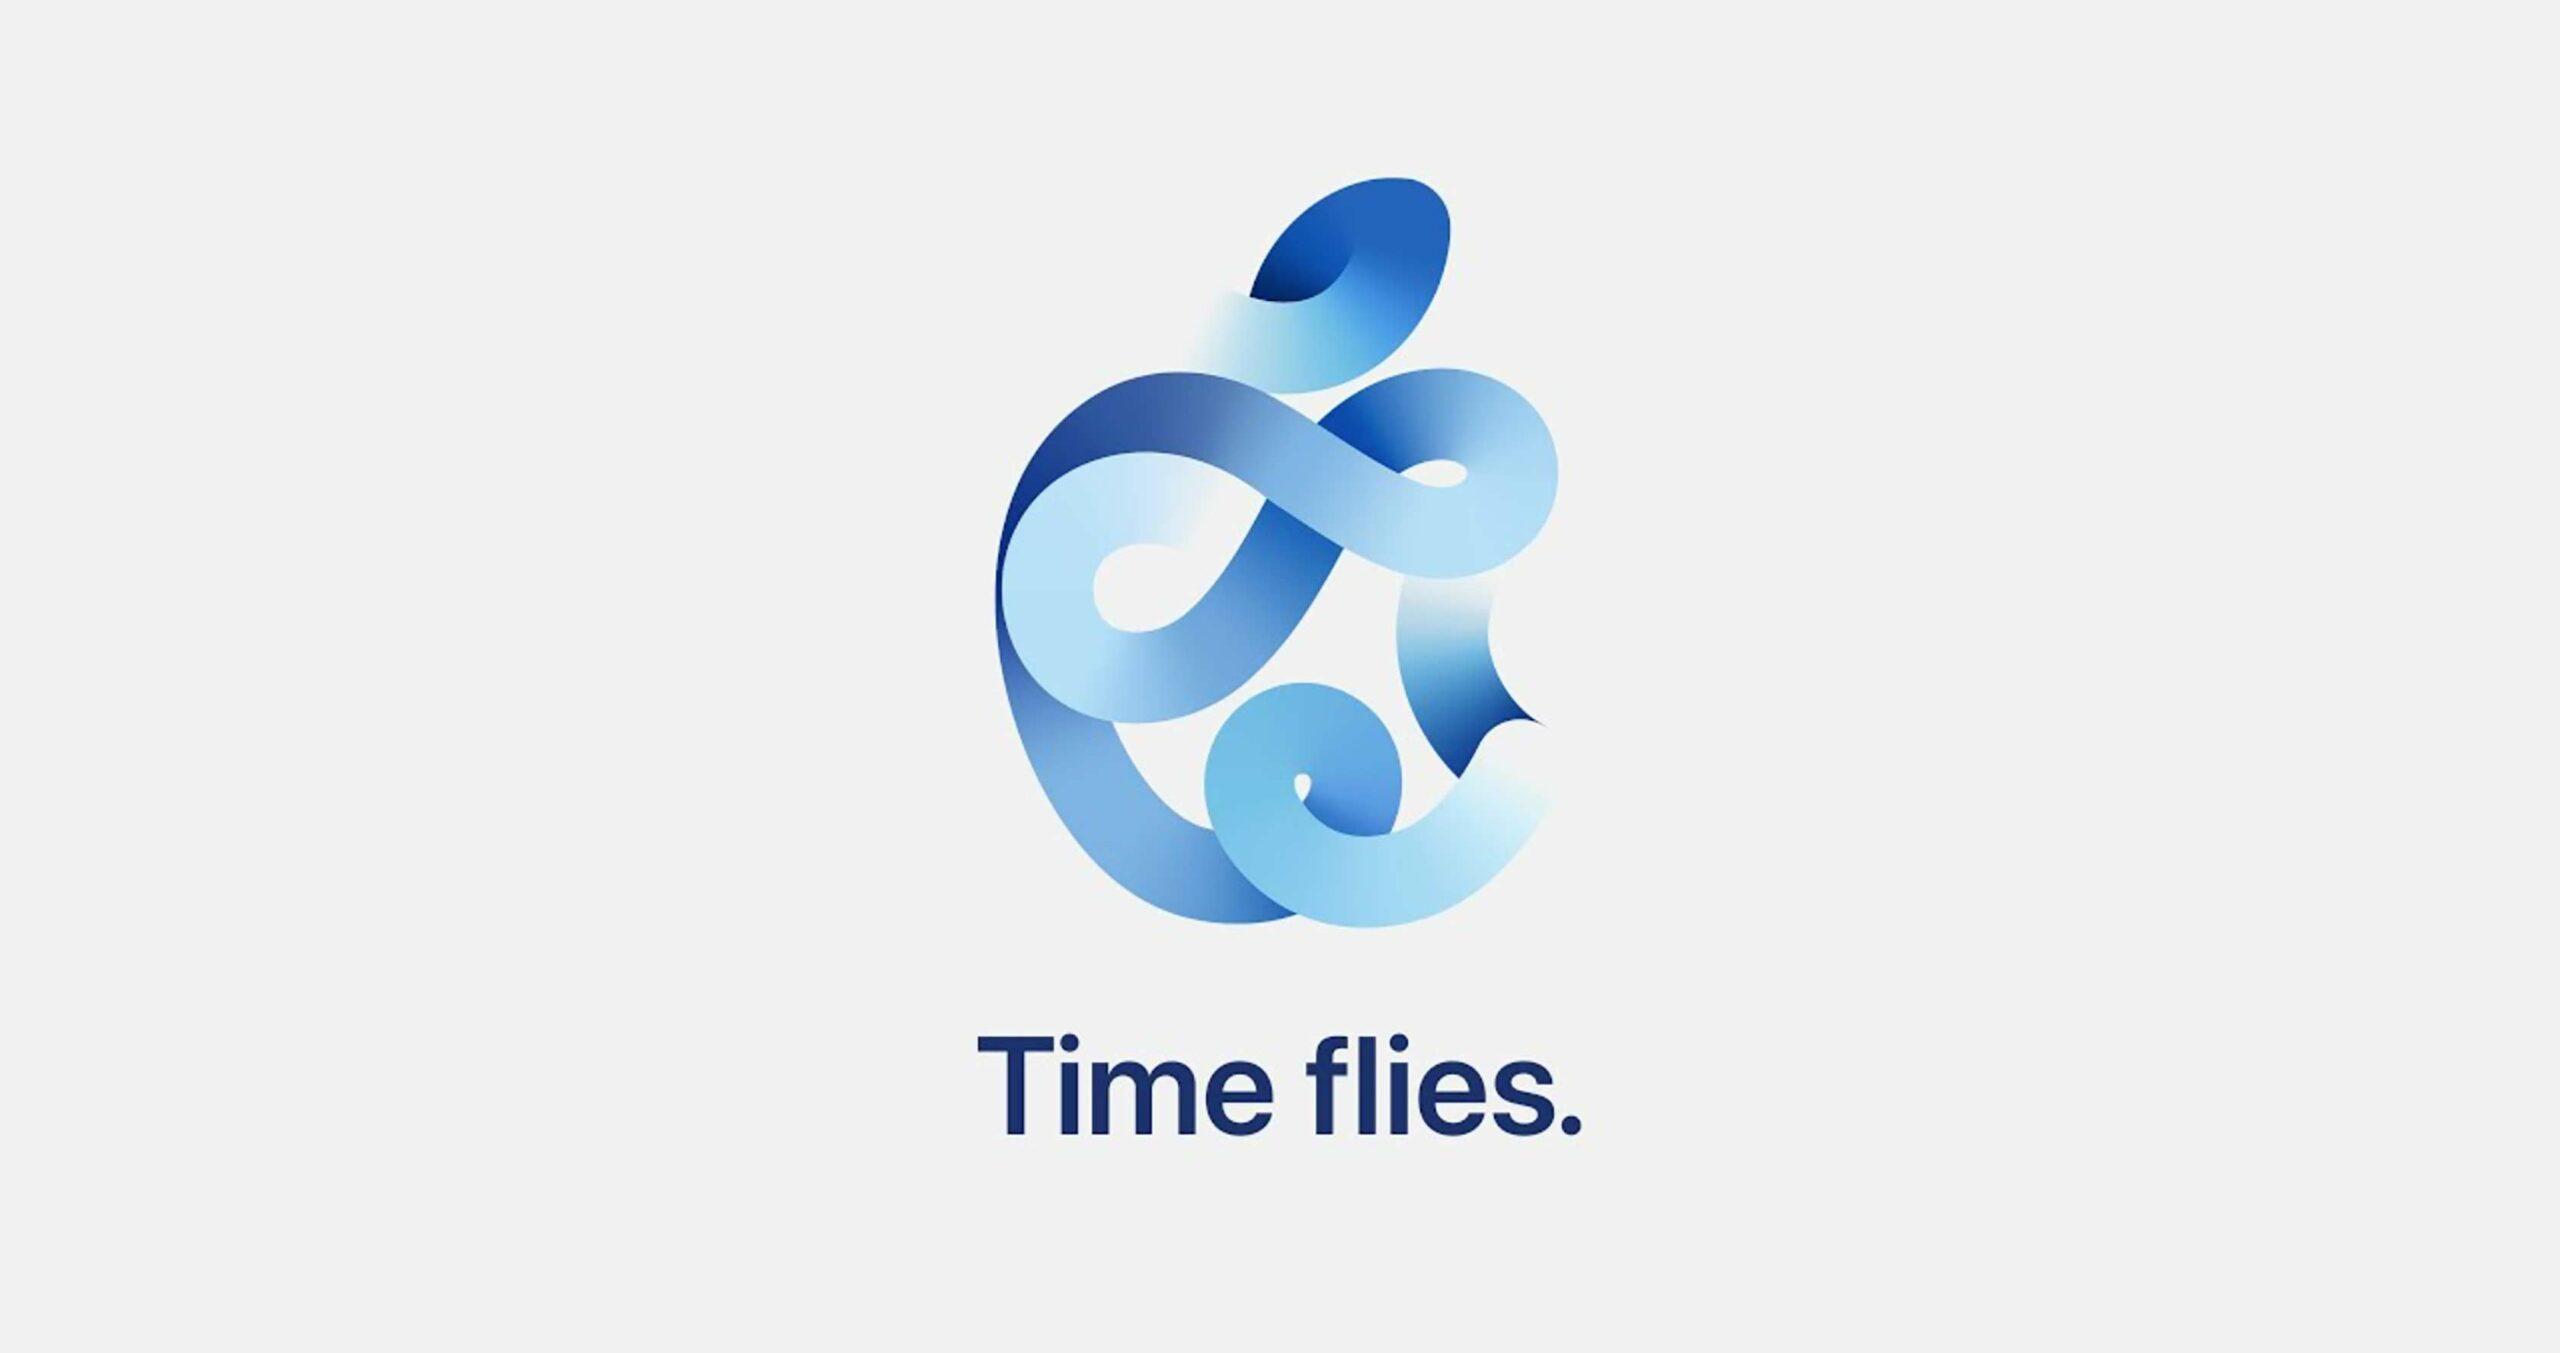 Apple Time Flies